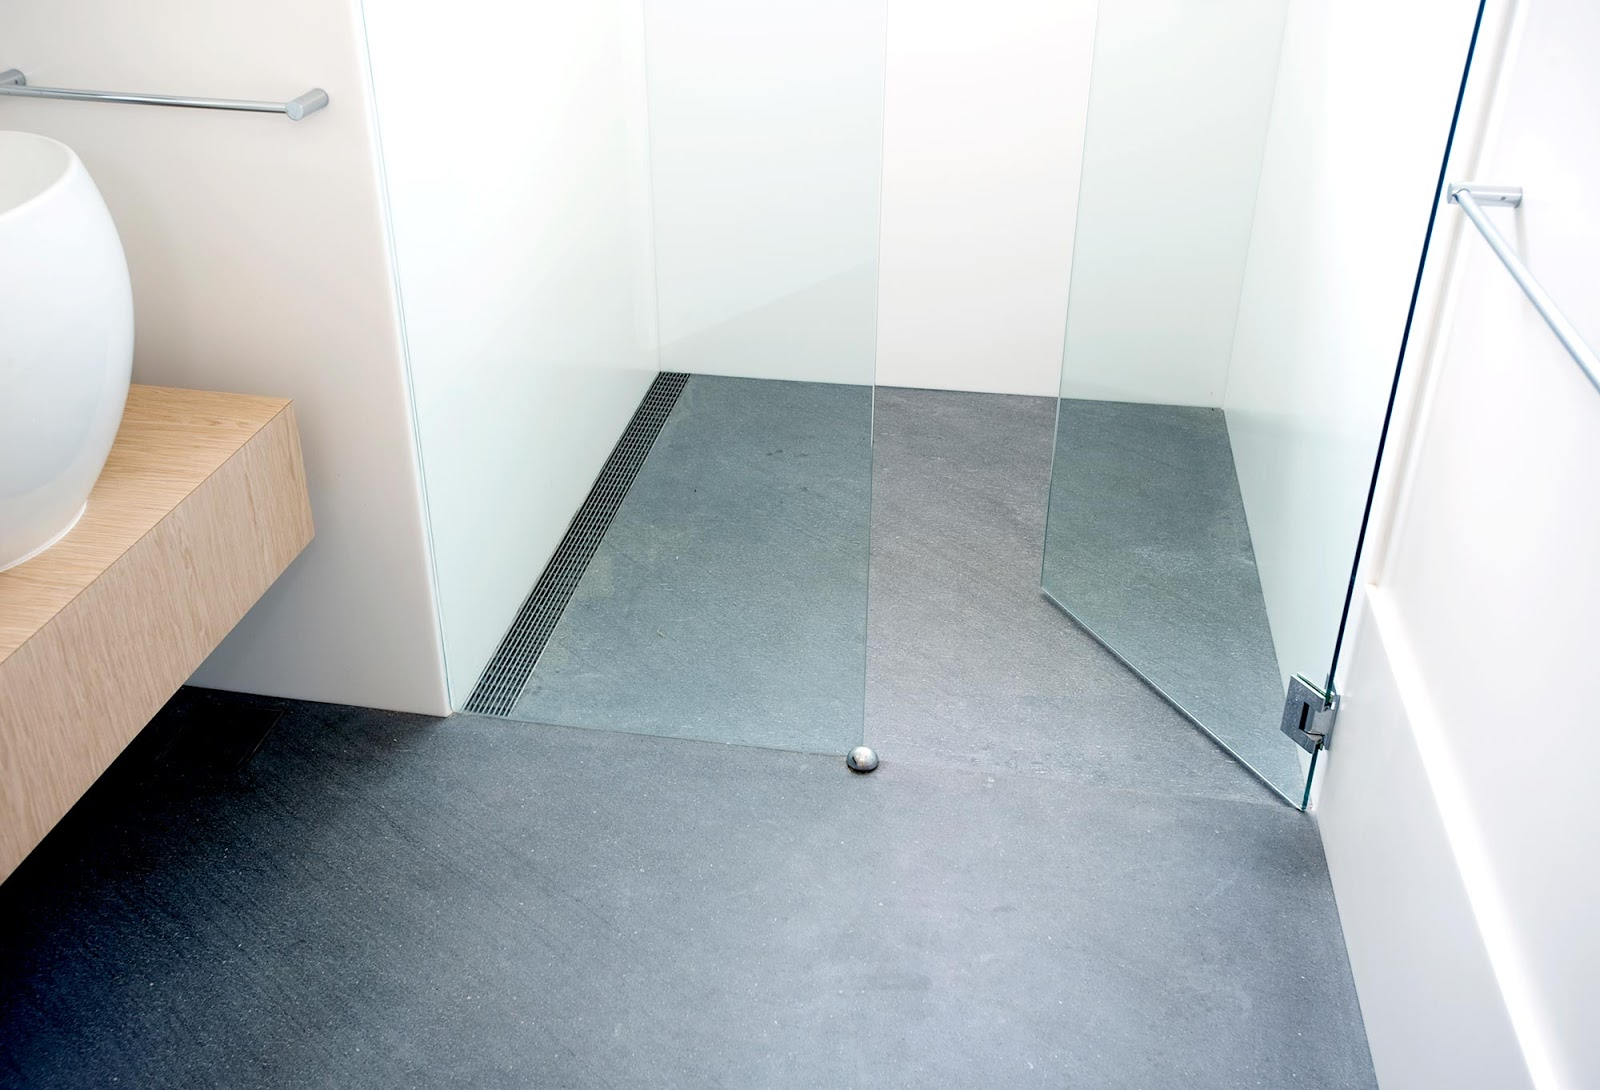 Fiorito Interior Design The Shower Drain Now You See It